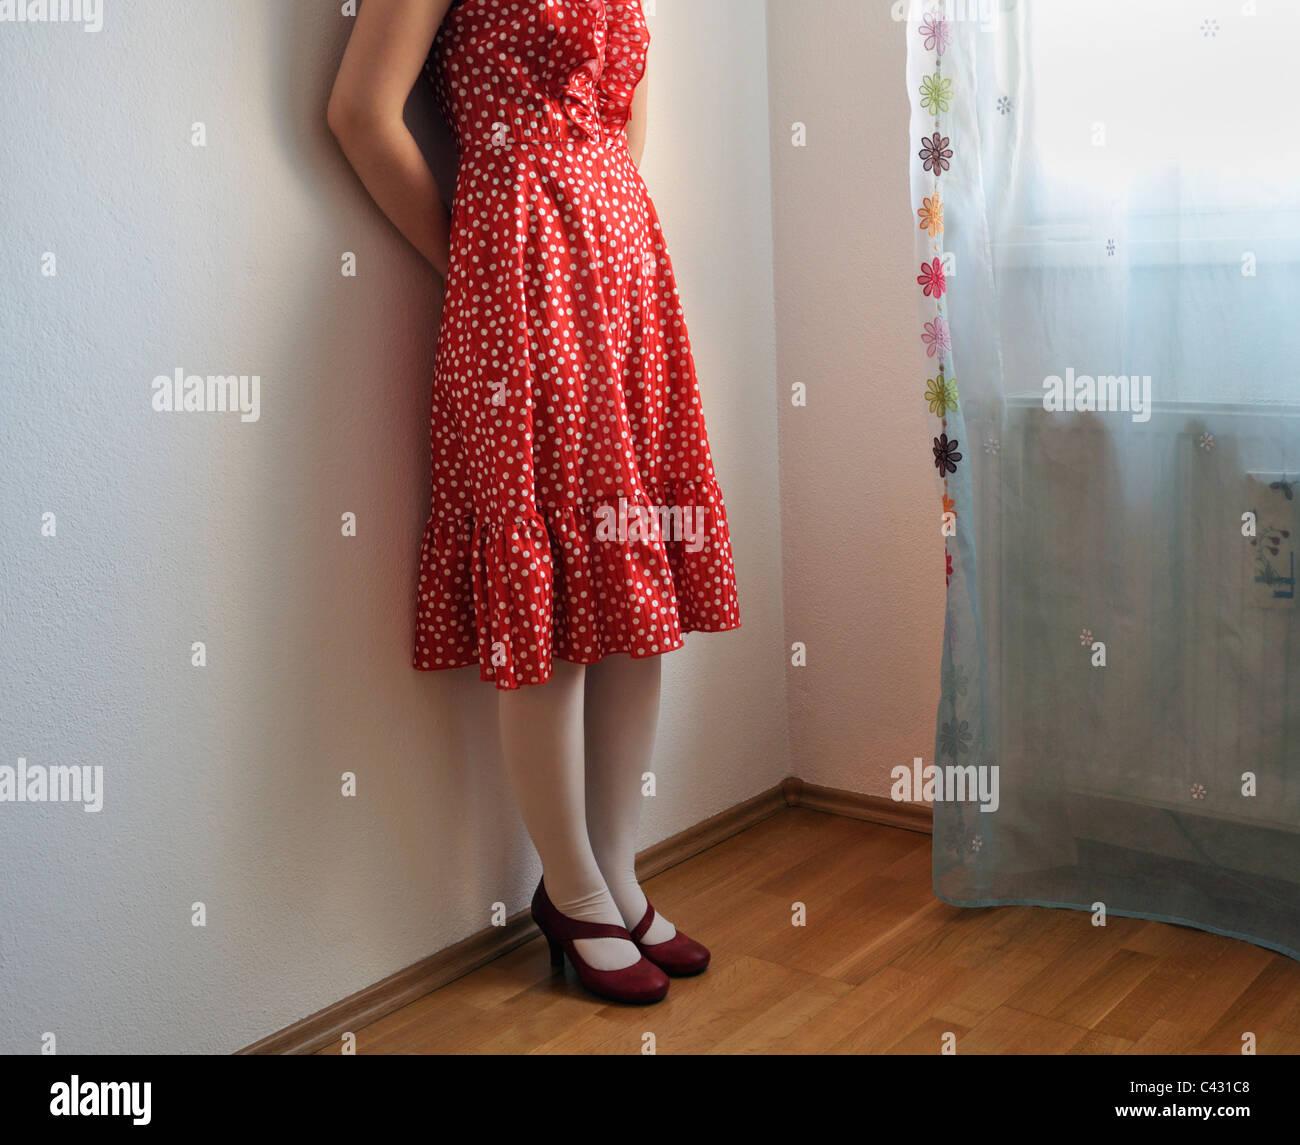 Young woman wearing polka dot dress - Stock Image